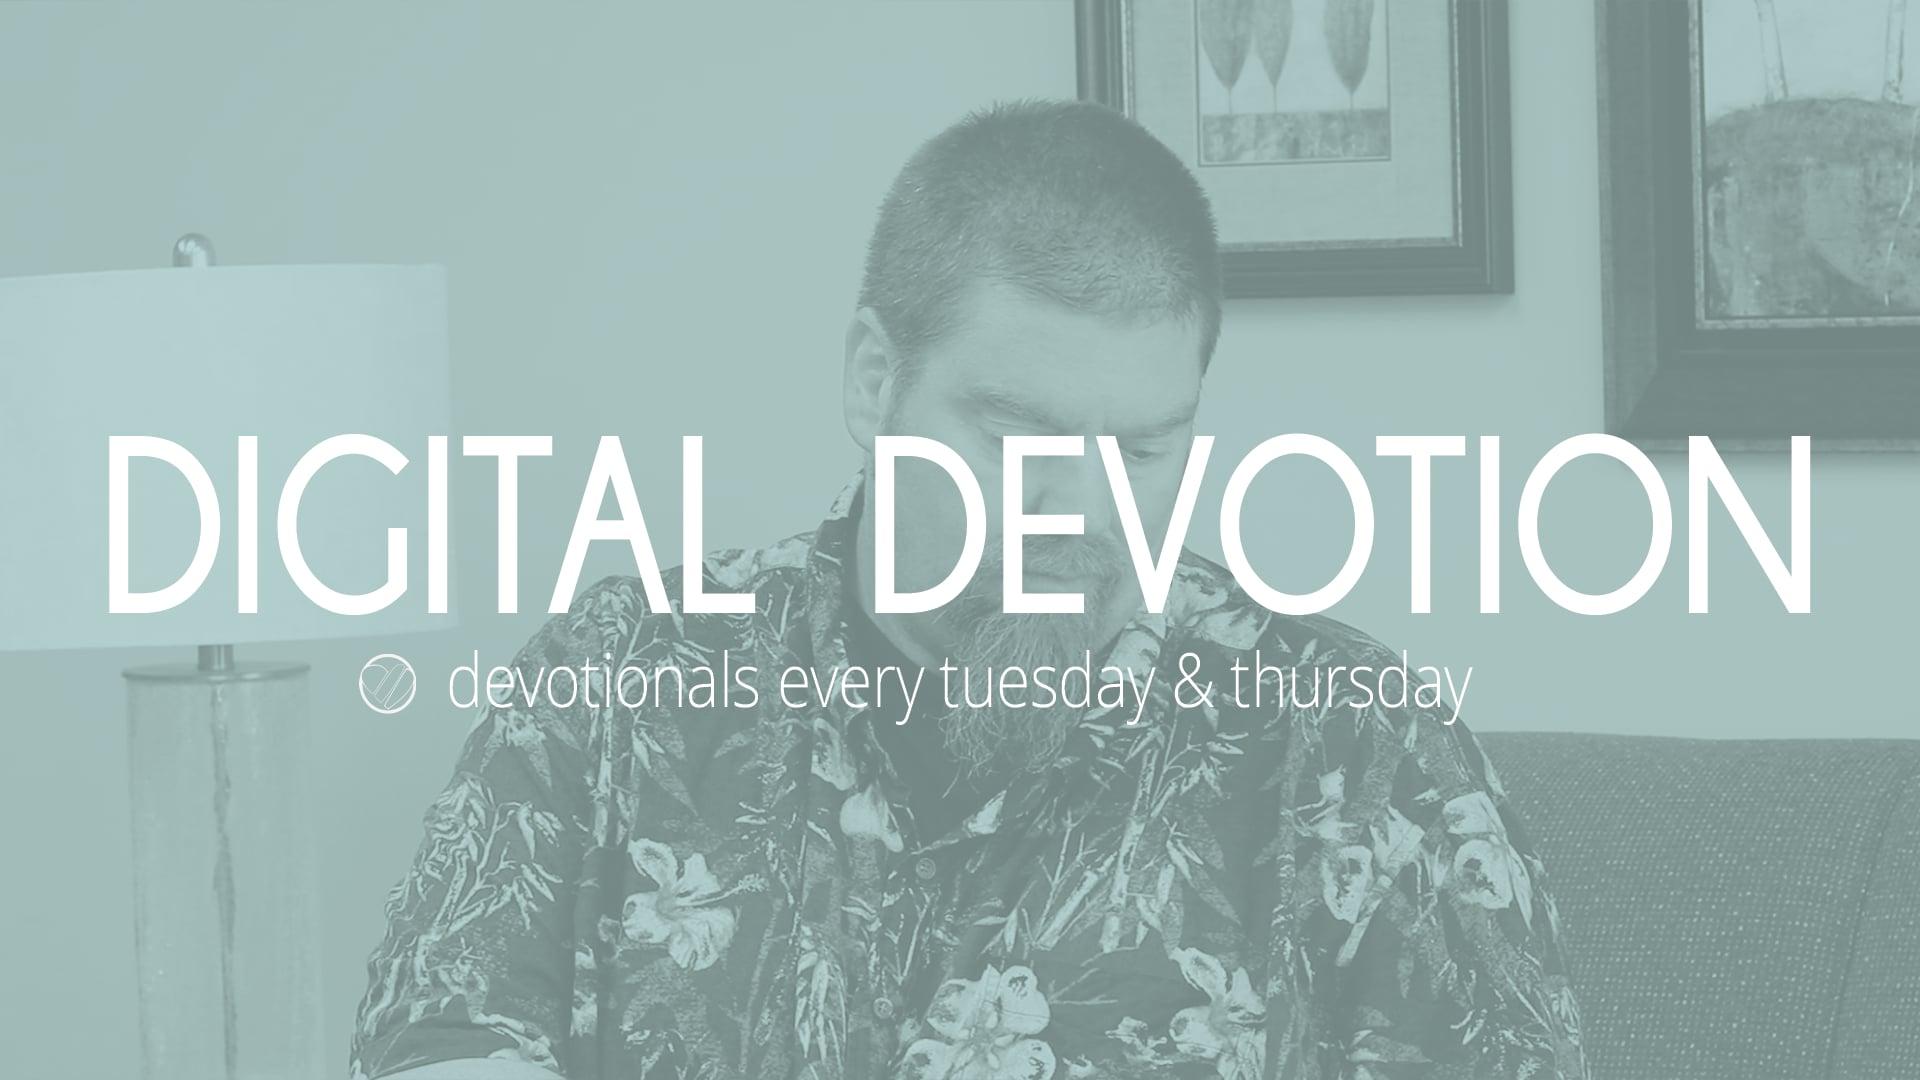 7.15.21 Digital Devotion